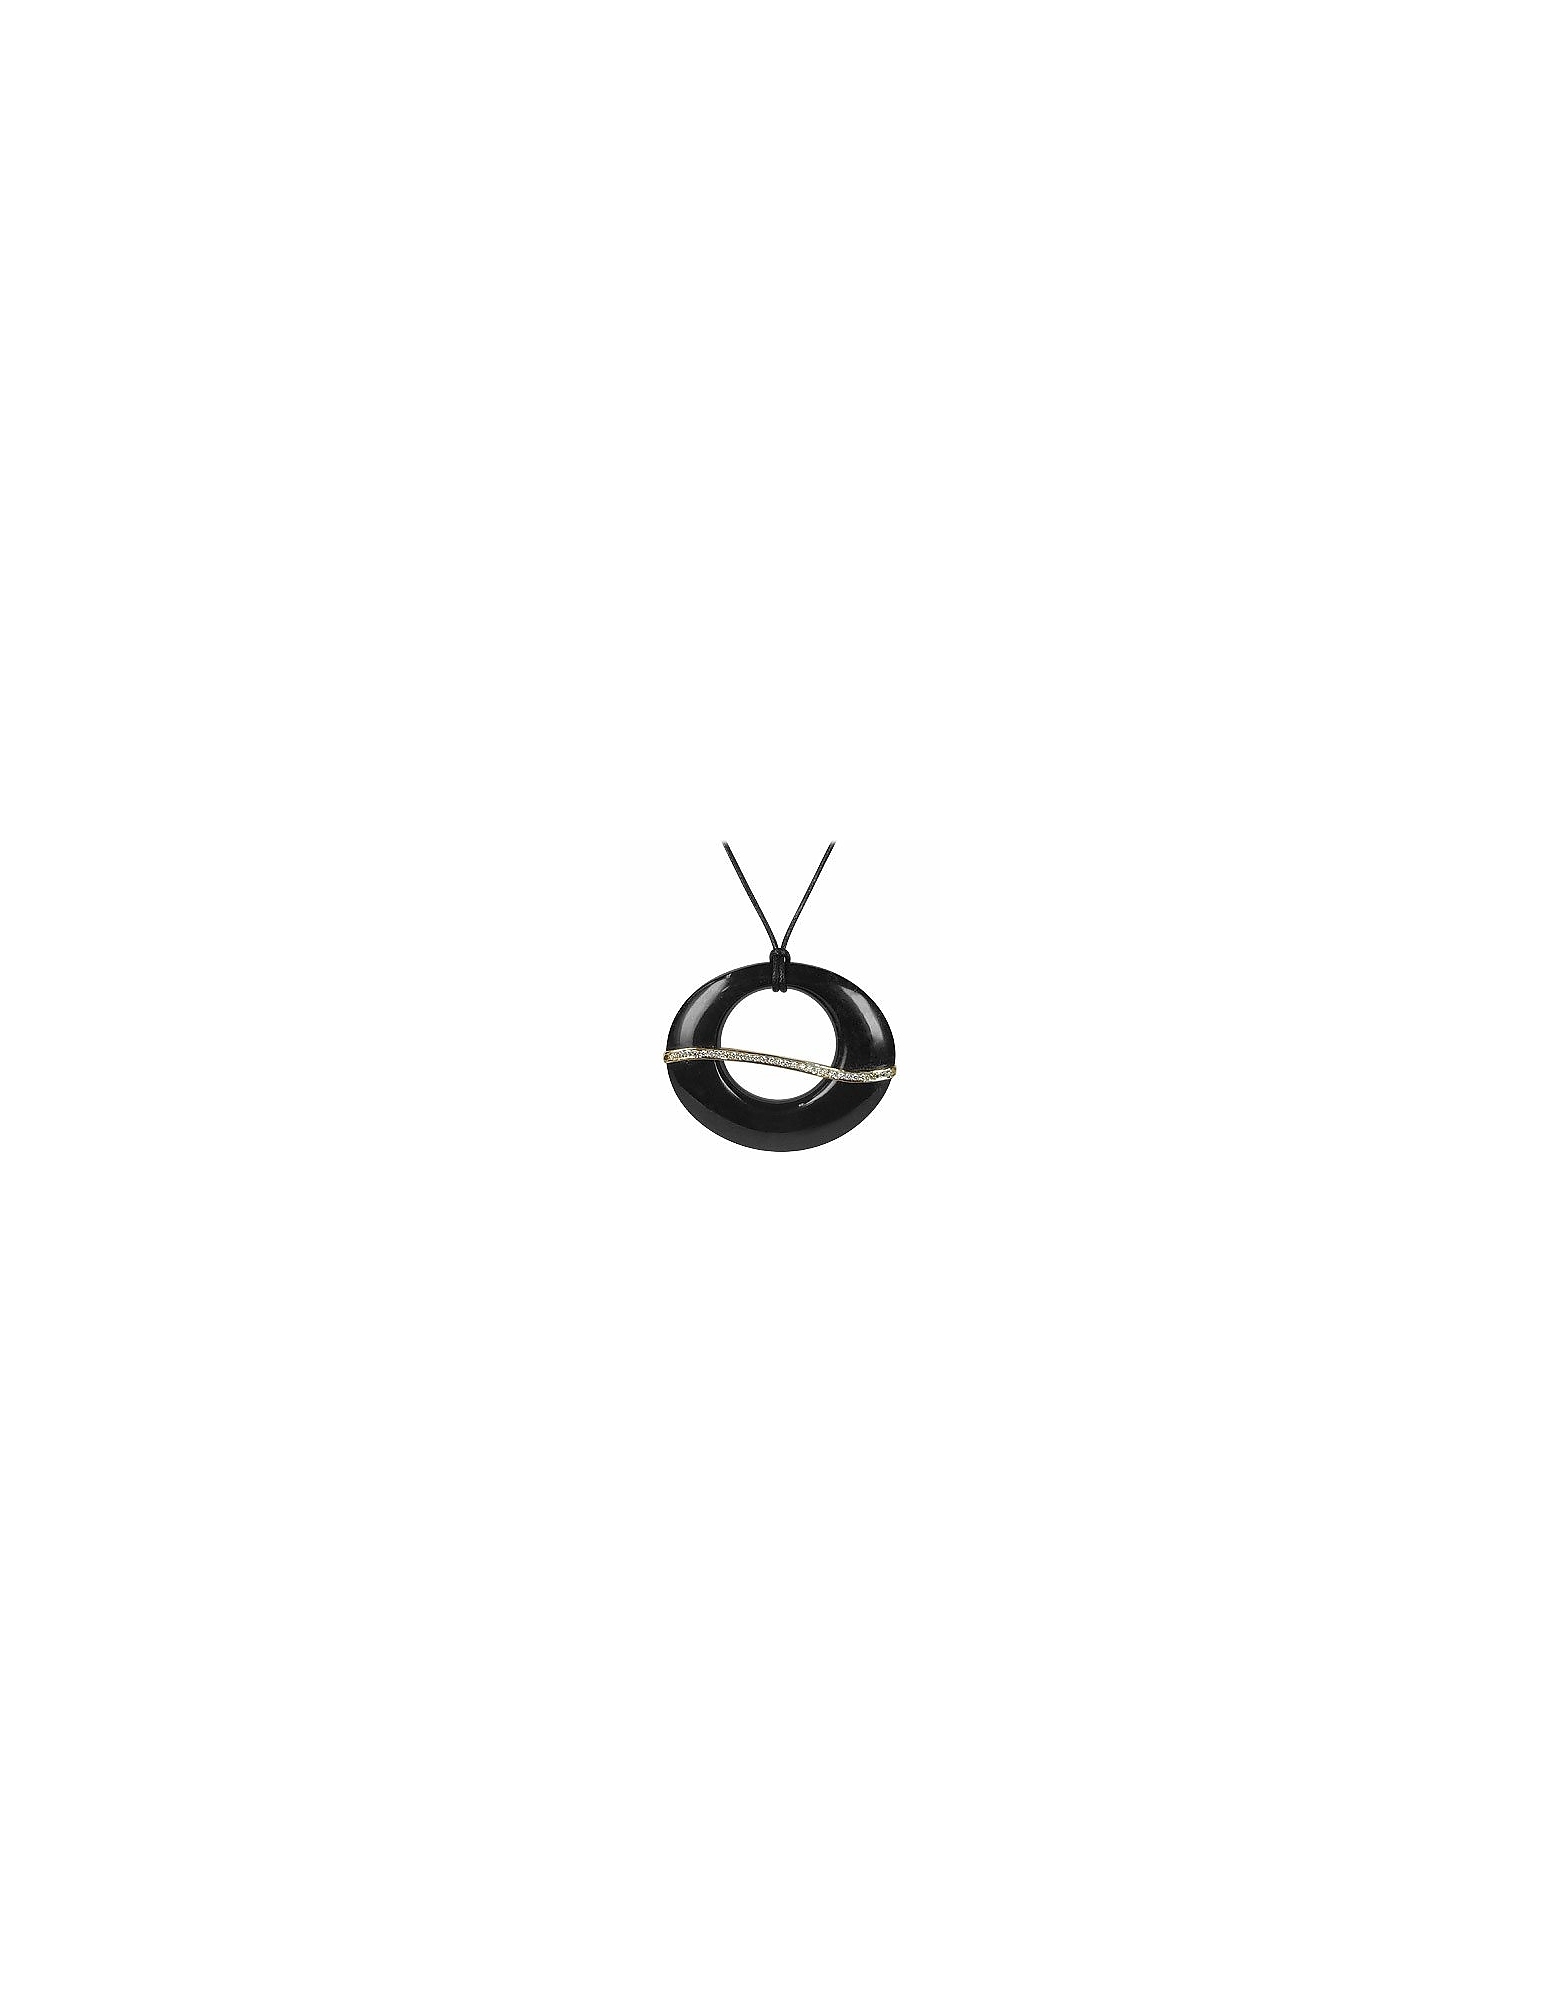 Torrini Necklaces, Pietrasanta - Marble & Diamonds 18K Gold Pendant